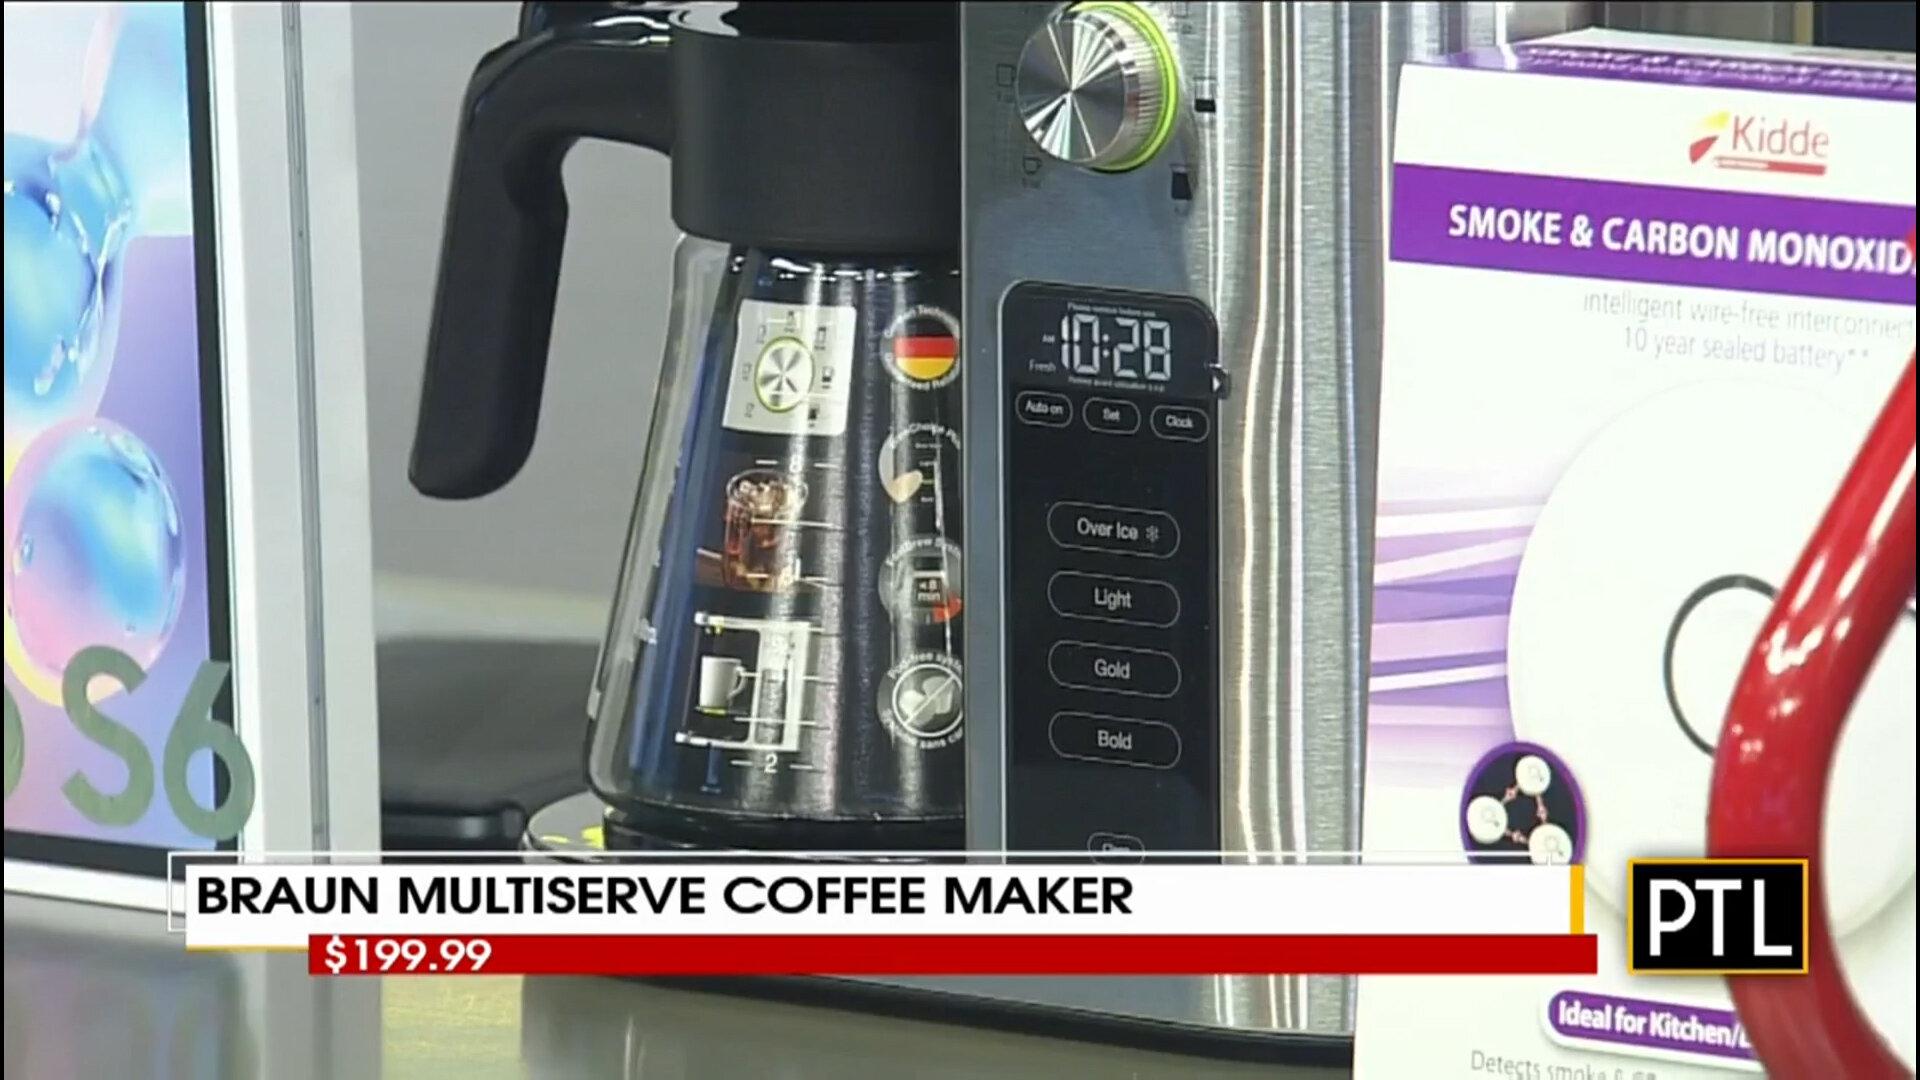 BRAUN MULTISERVE COFFEE MAKER - $199.99Shop Now